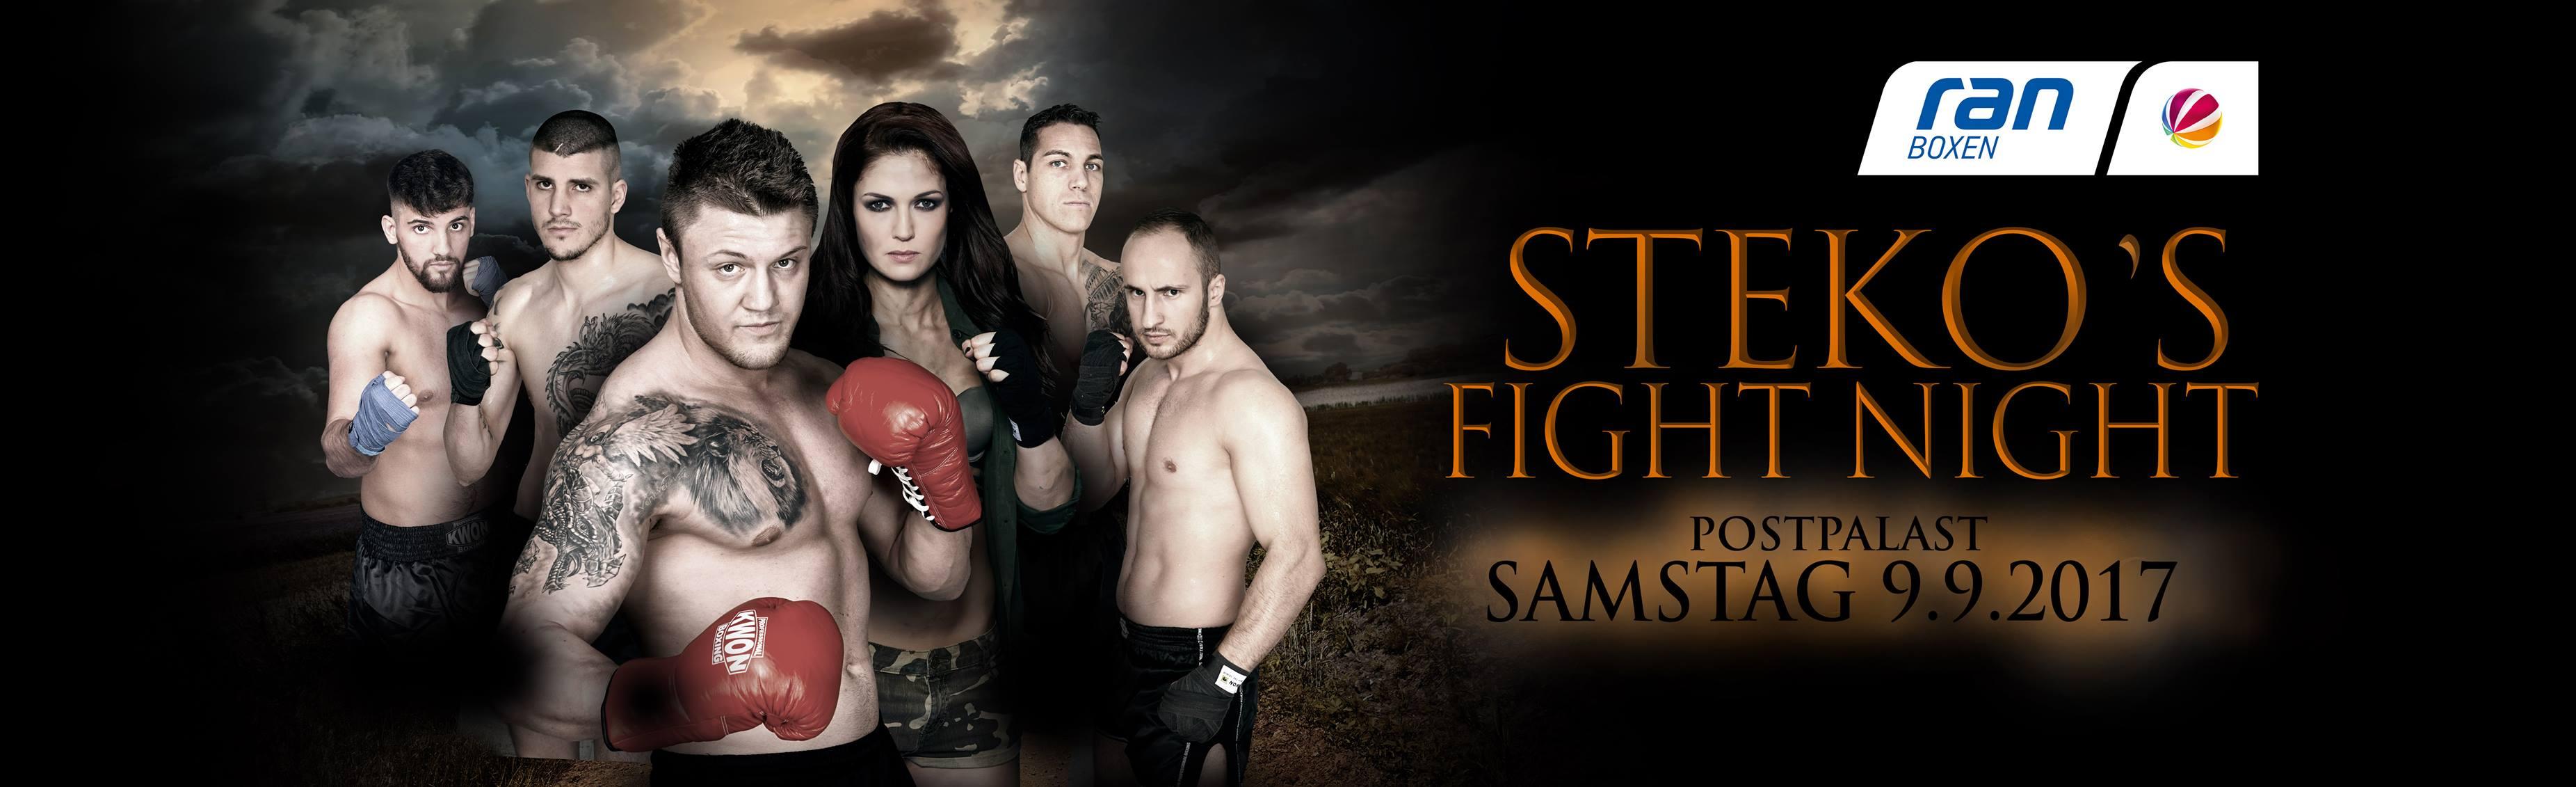 Steko's Fight Night